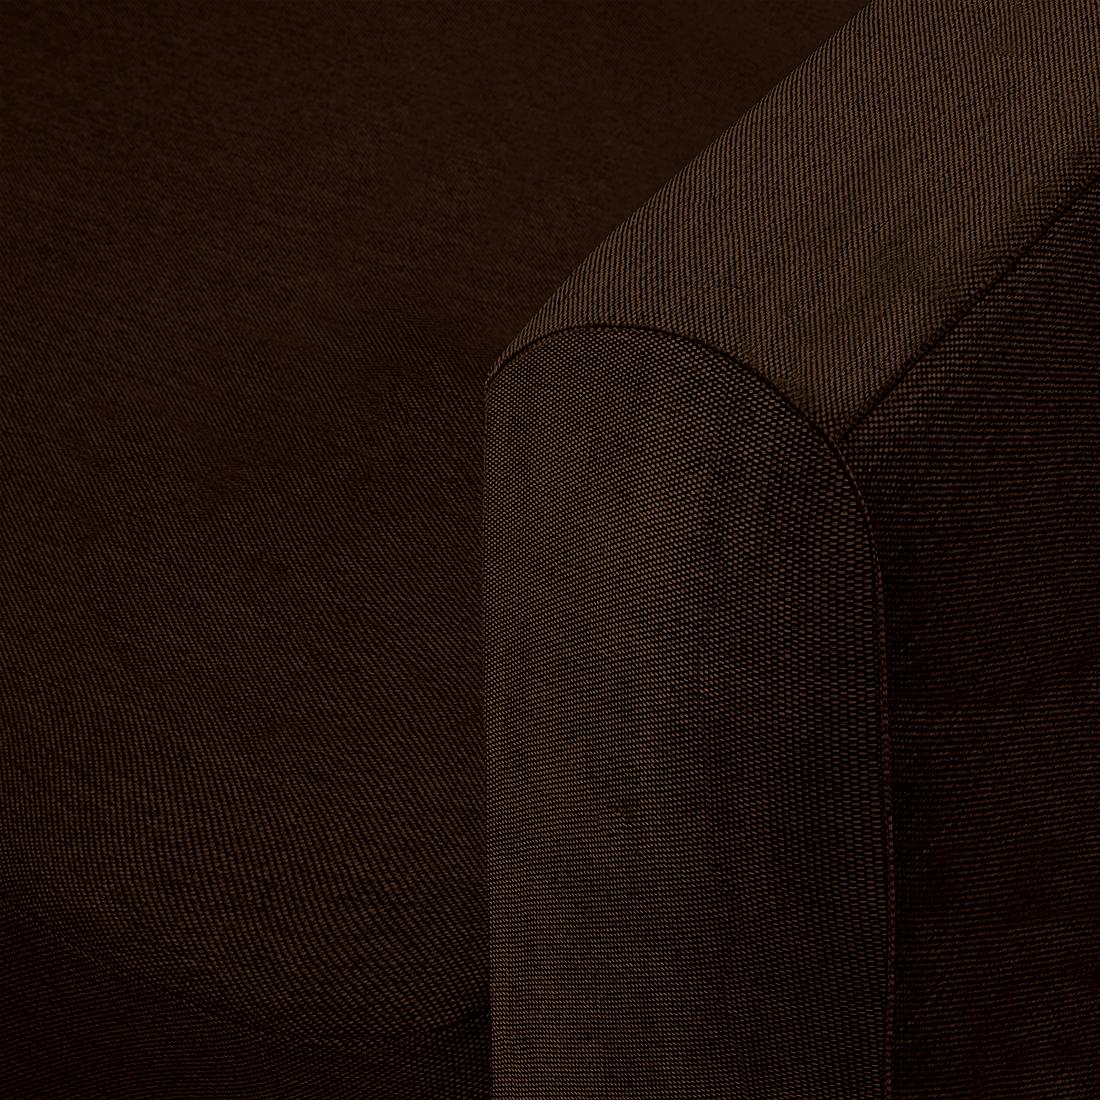 clubsessel webstoff braun f e holz buche cocktailsessel loungesessel sessel neu ebay. Black Bedroom Furniture Sets. Home Design Ideas